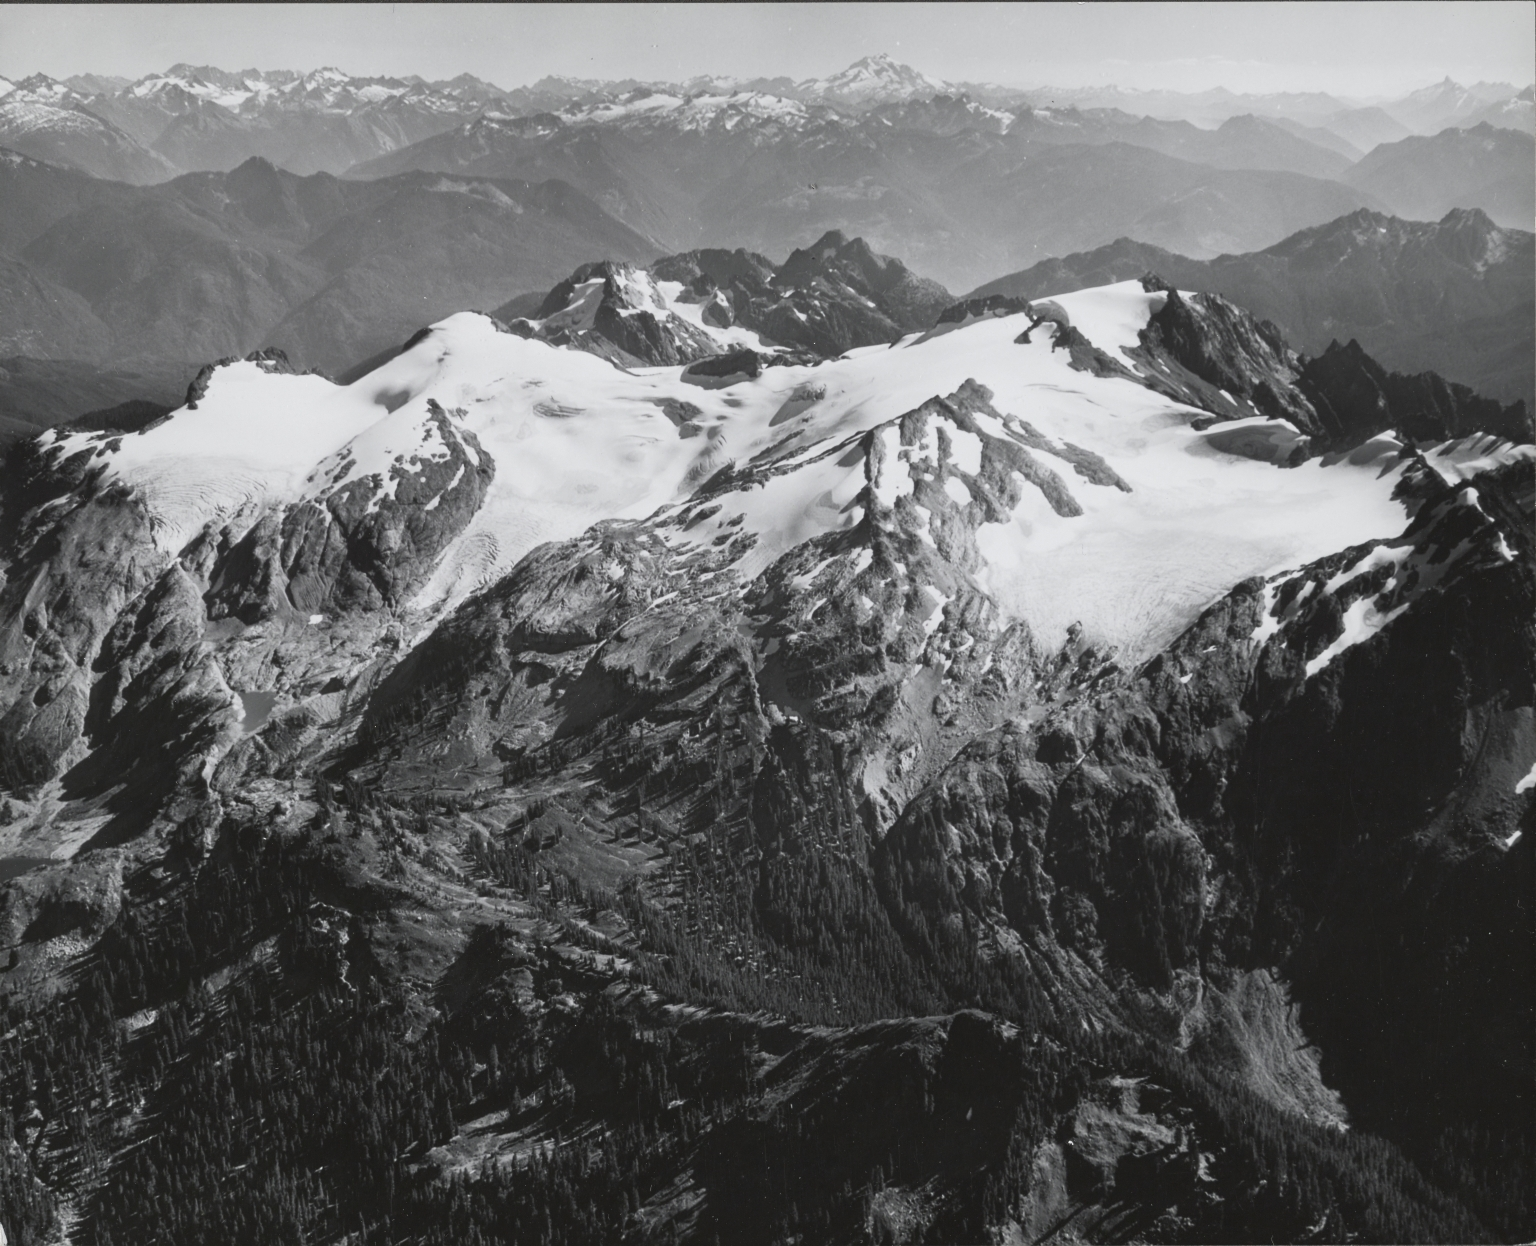 Bacon Peak, Washington.